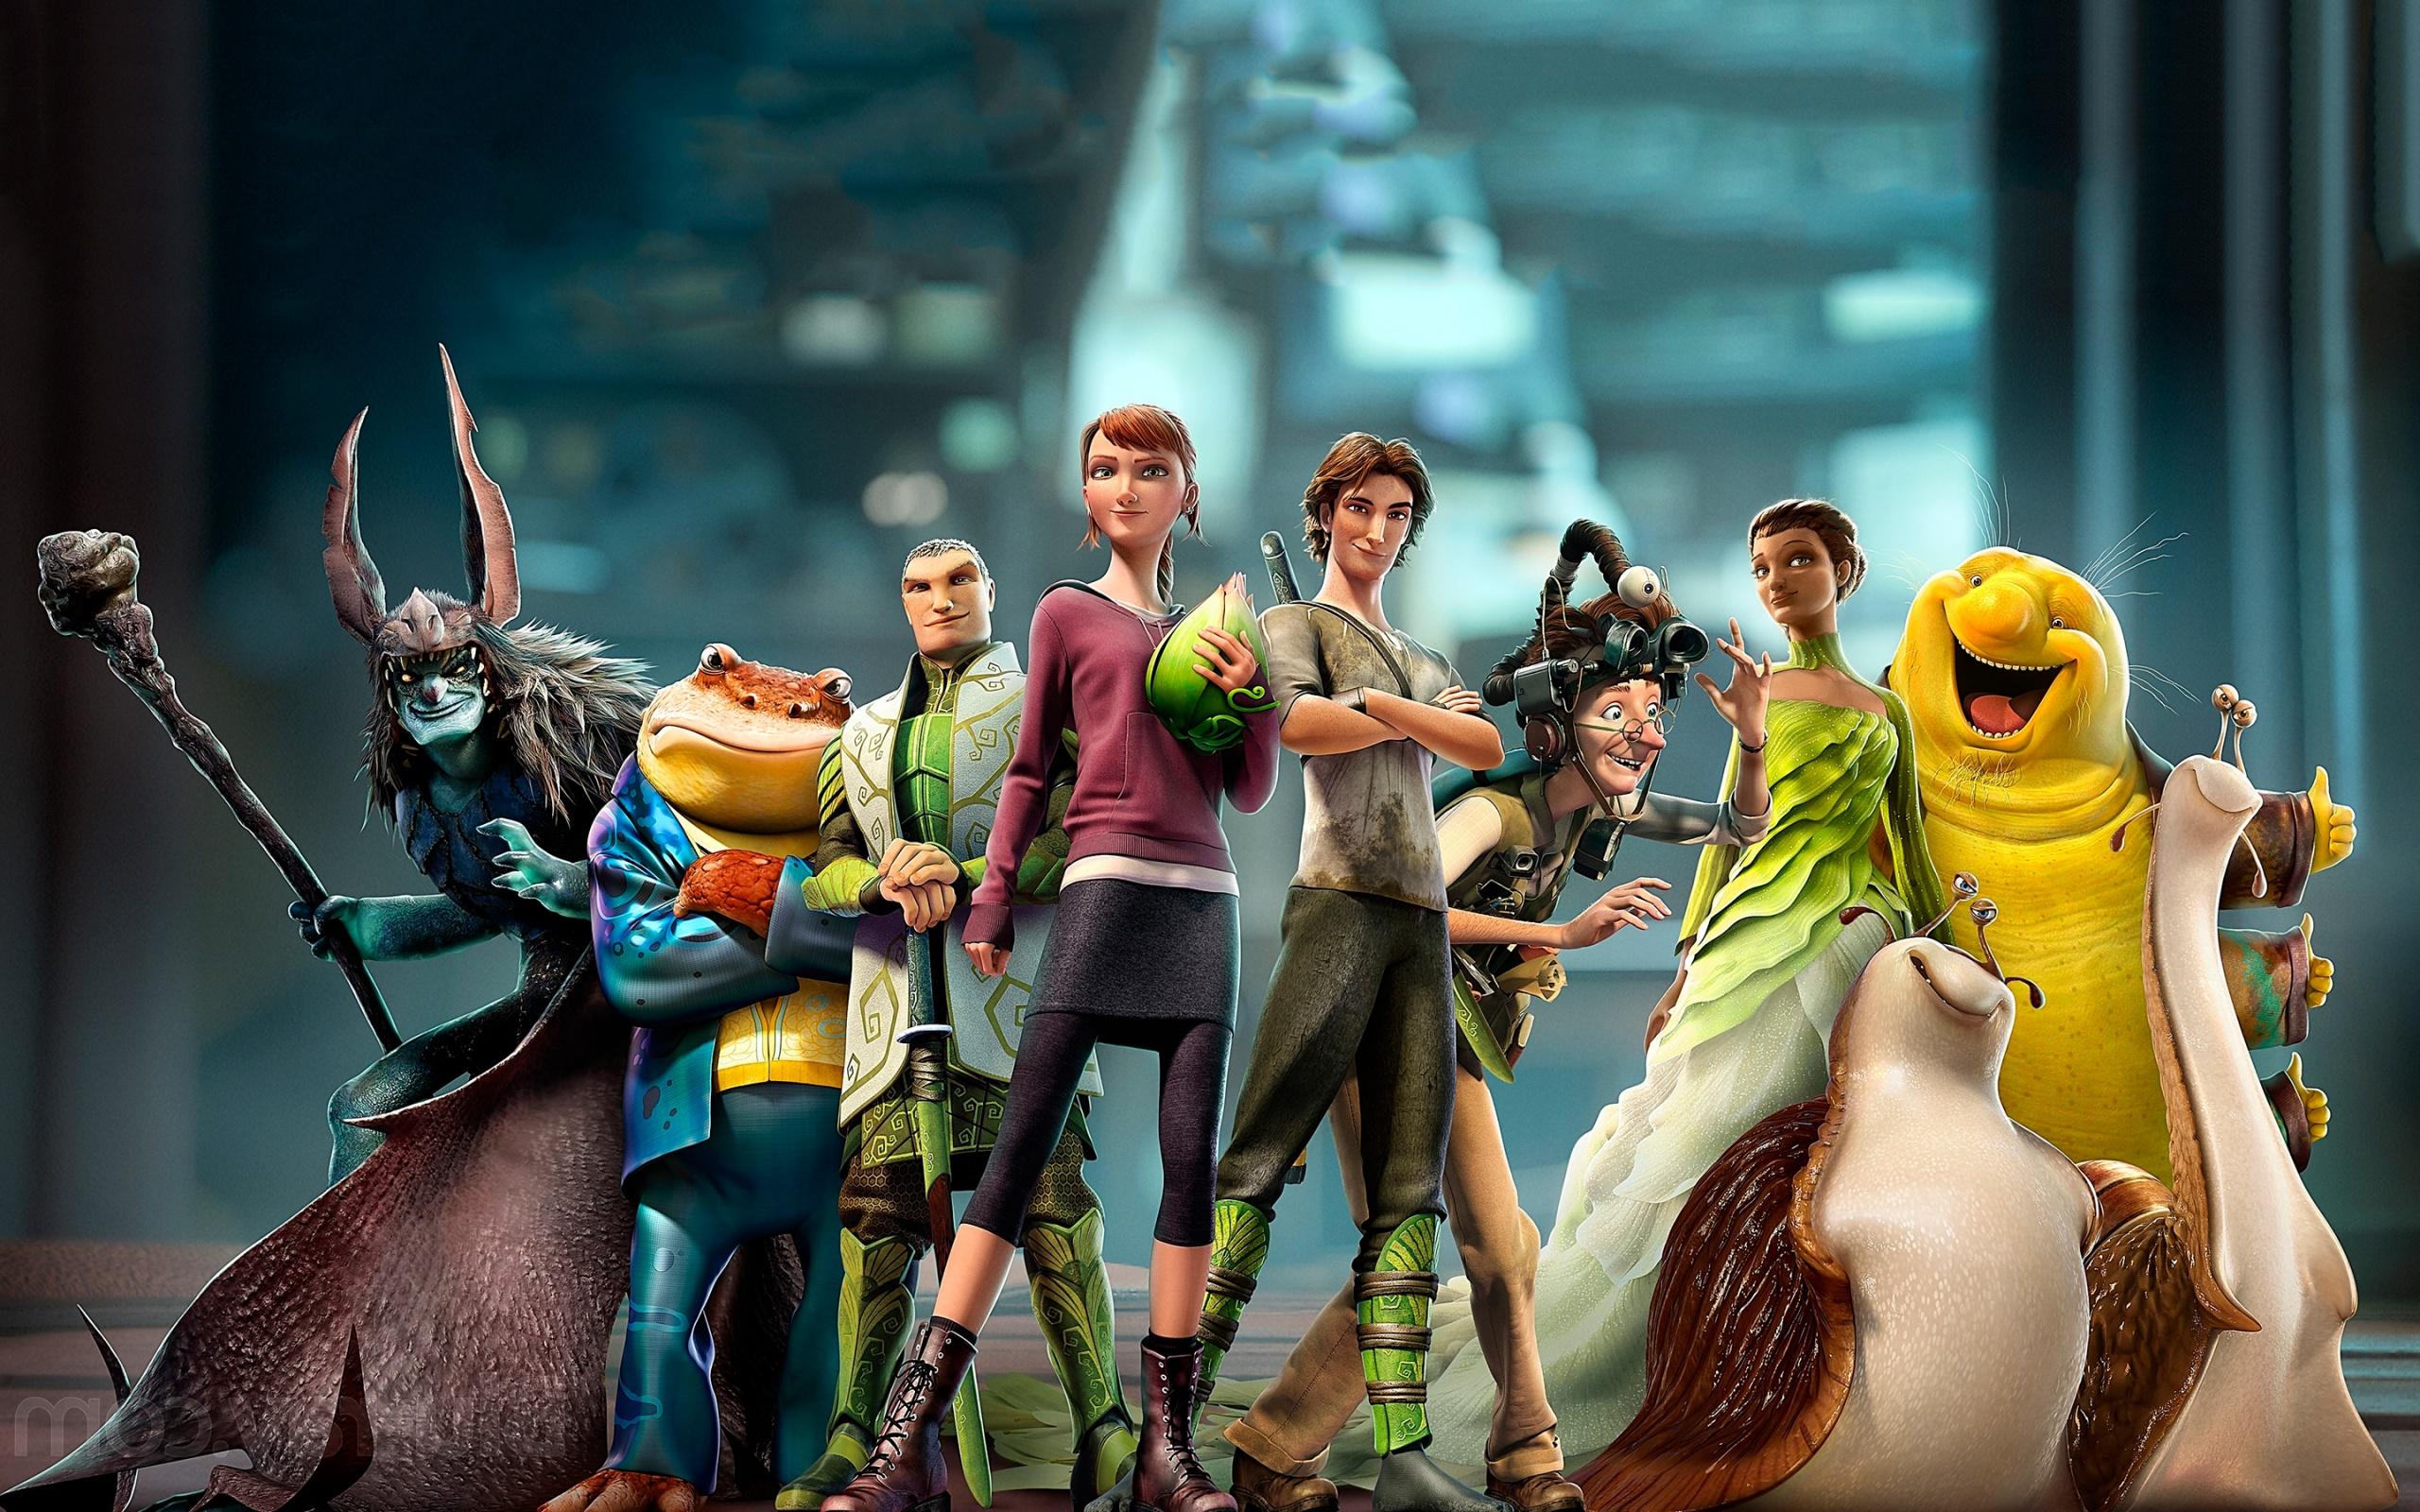 Epic-3D-Movie-2013